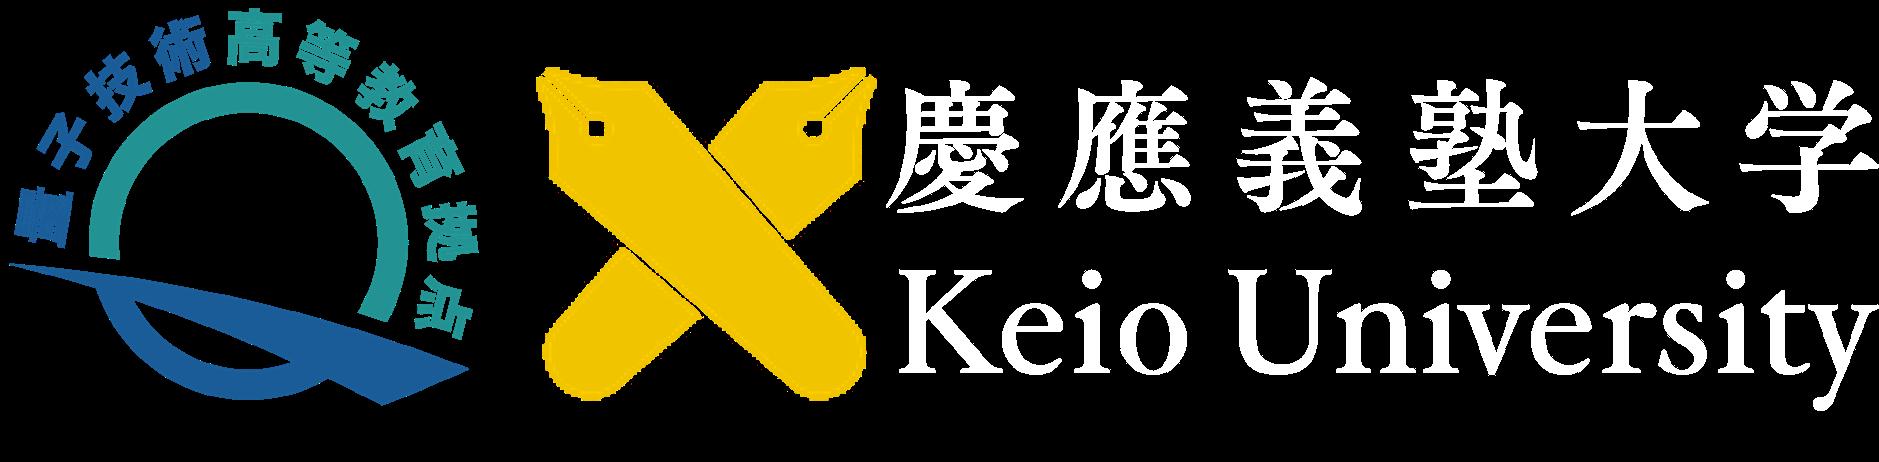 QLEAP Education - Keio University